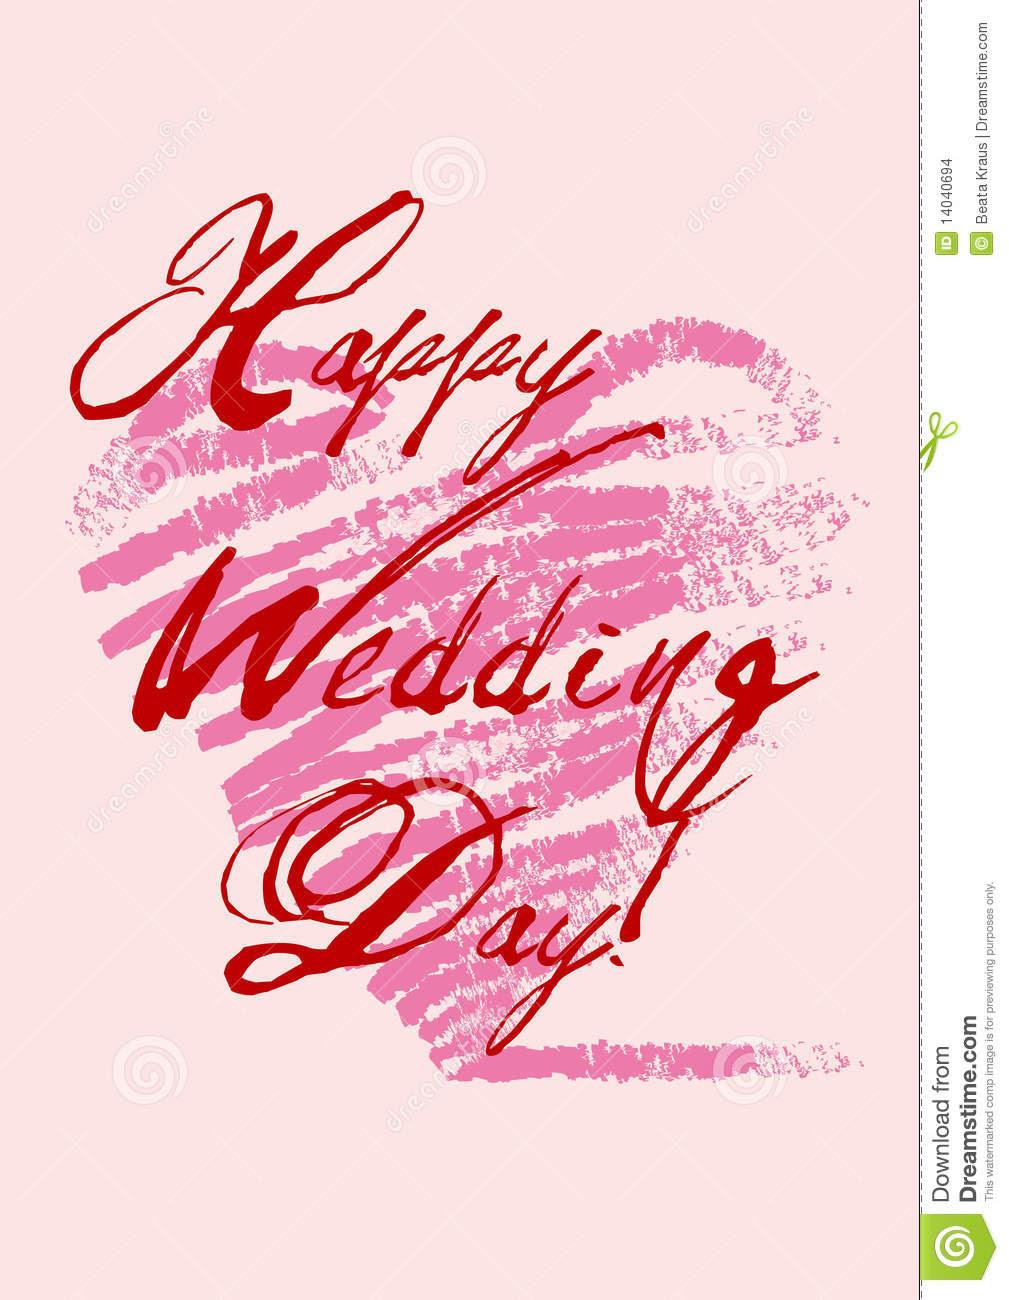 Happy Wedding Day 8